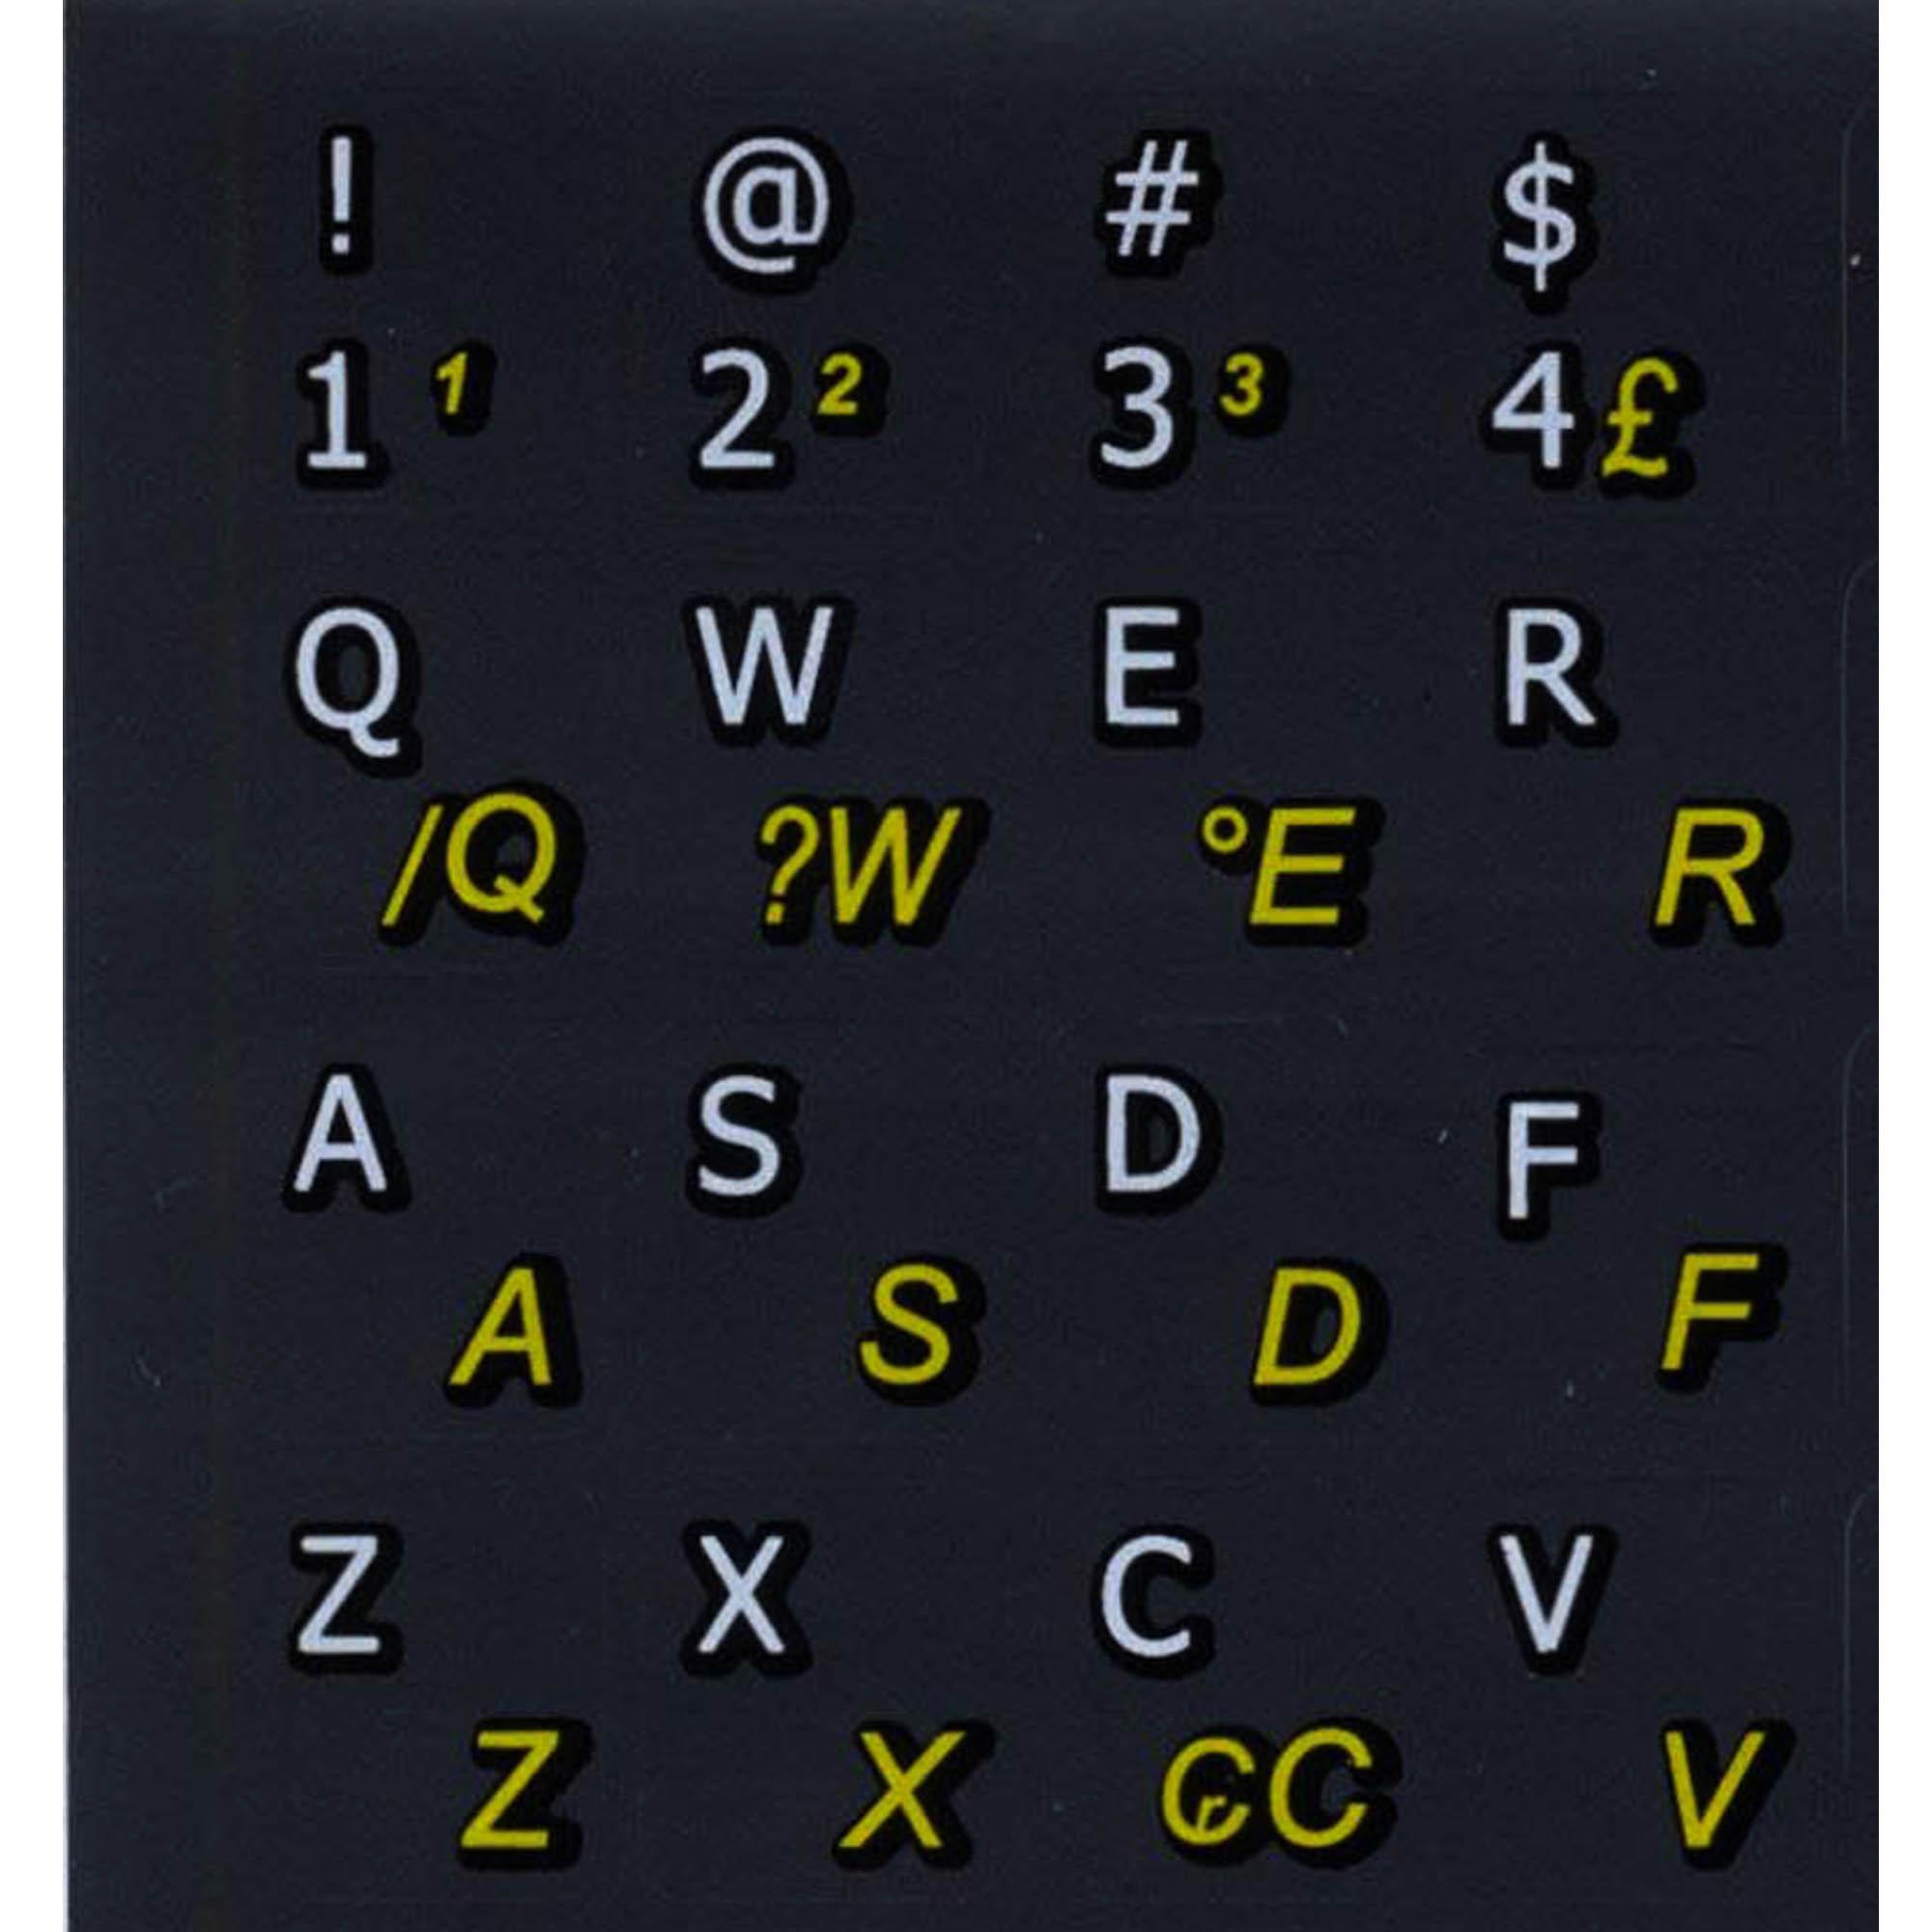 Brazilian Portuguese English keyboard stickers non transparent black